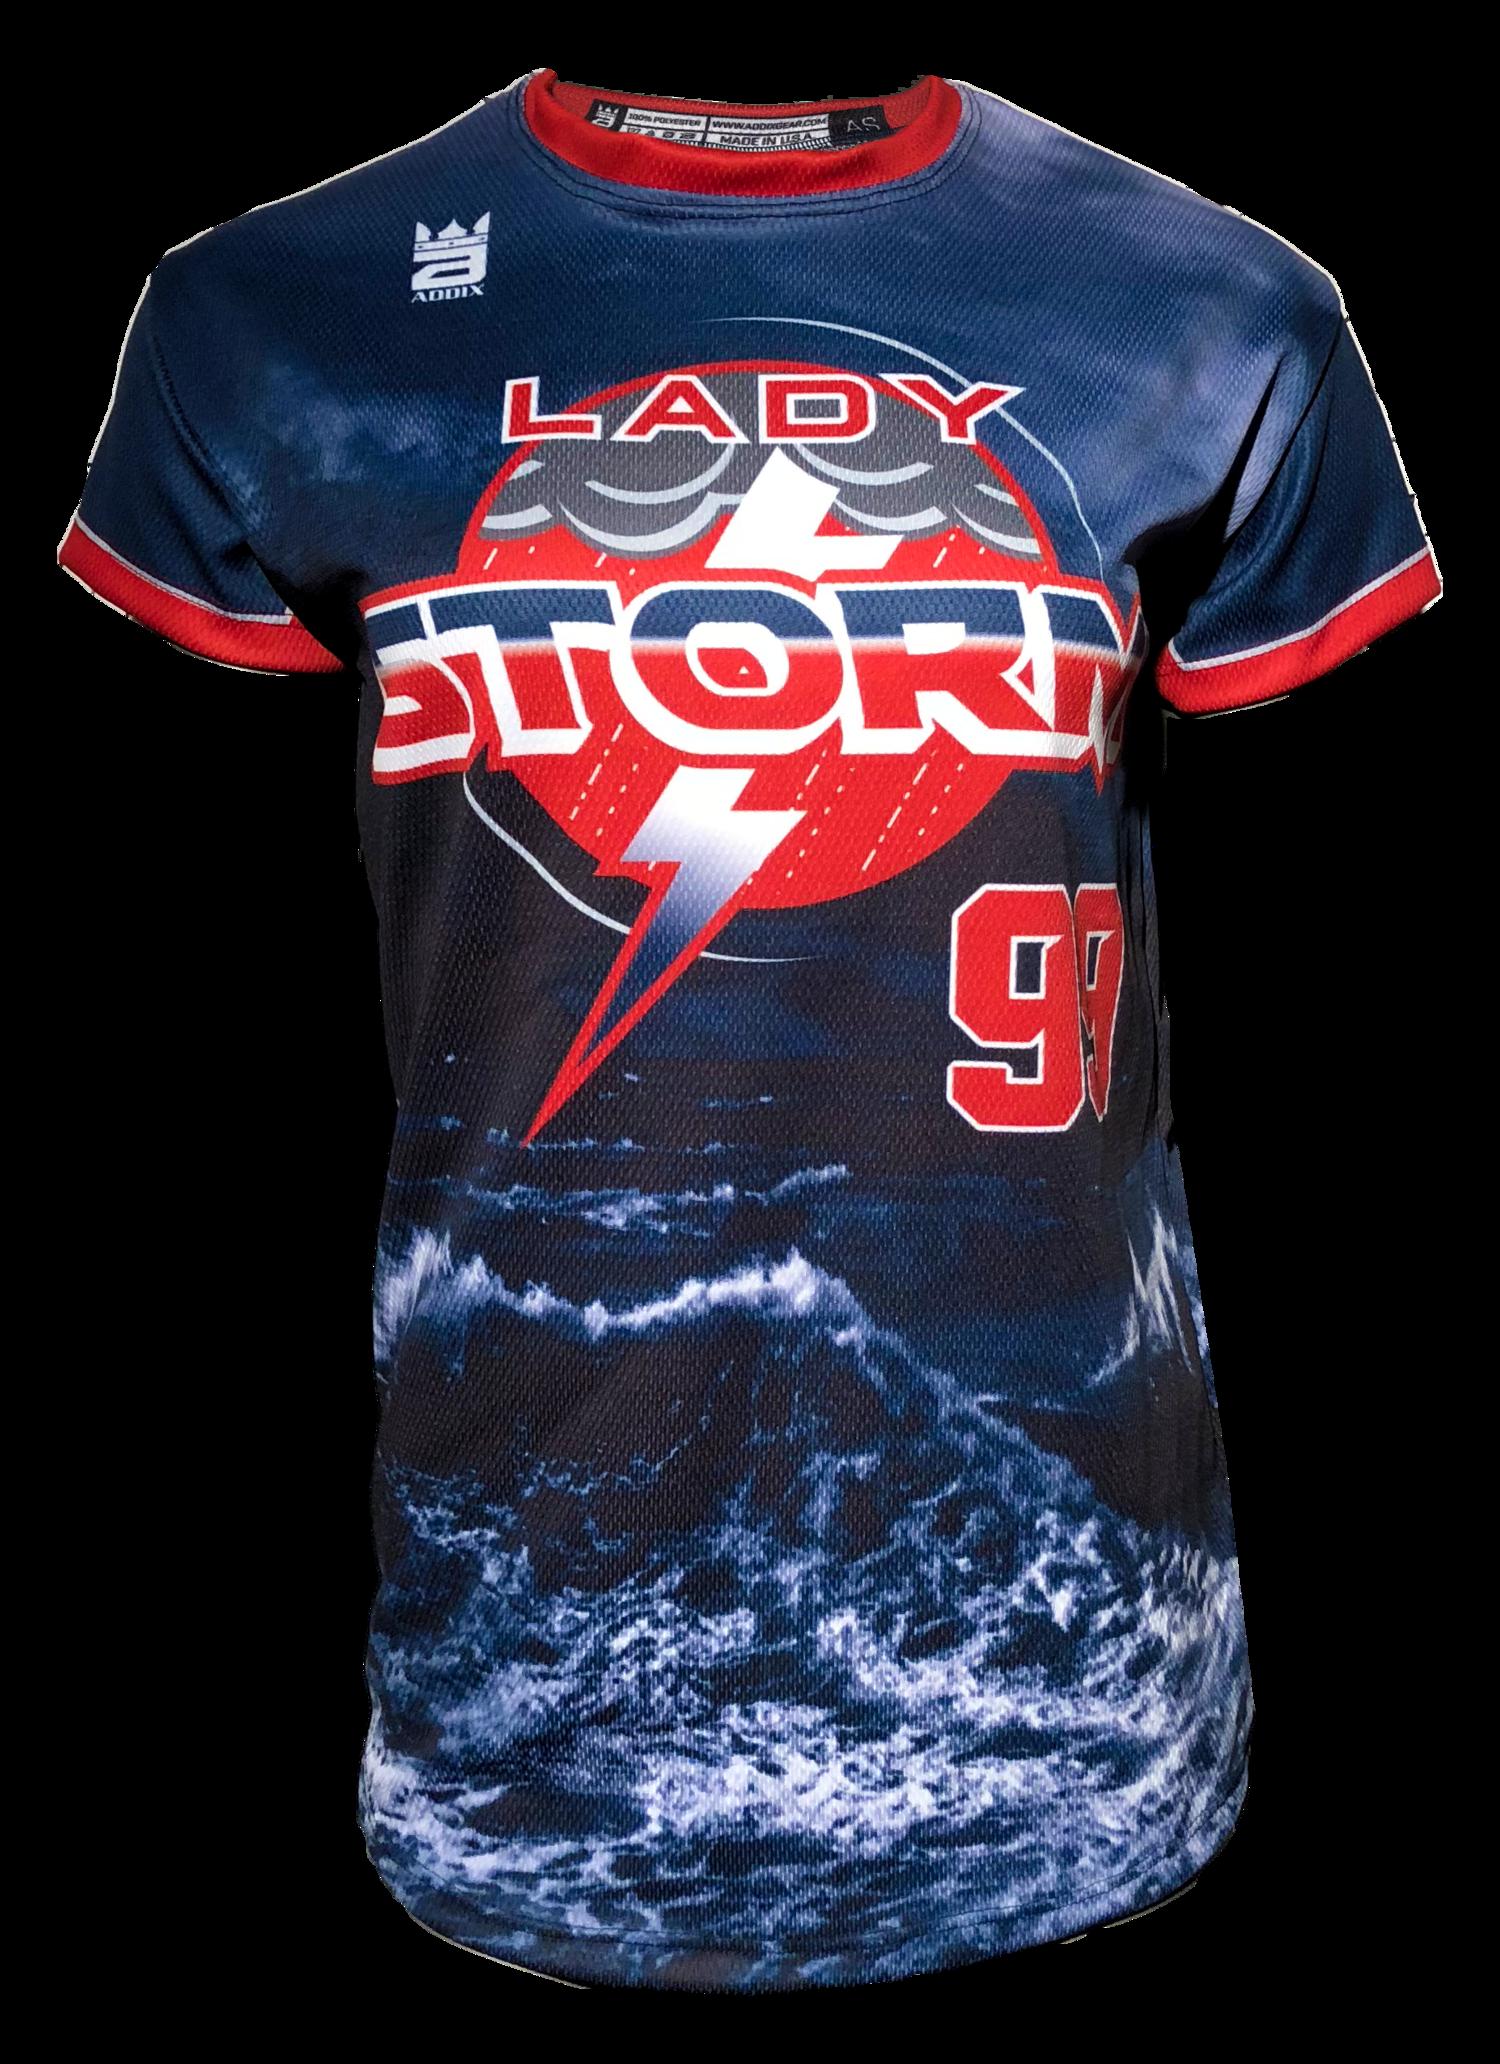 02457f38729 Custom Softball Jerseys and Uniforms — ADDIX Custom Team Gear